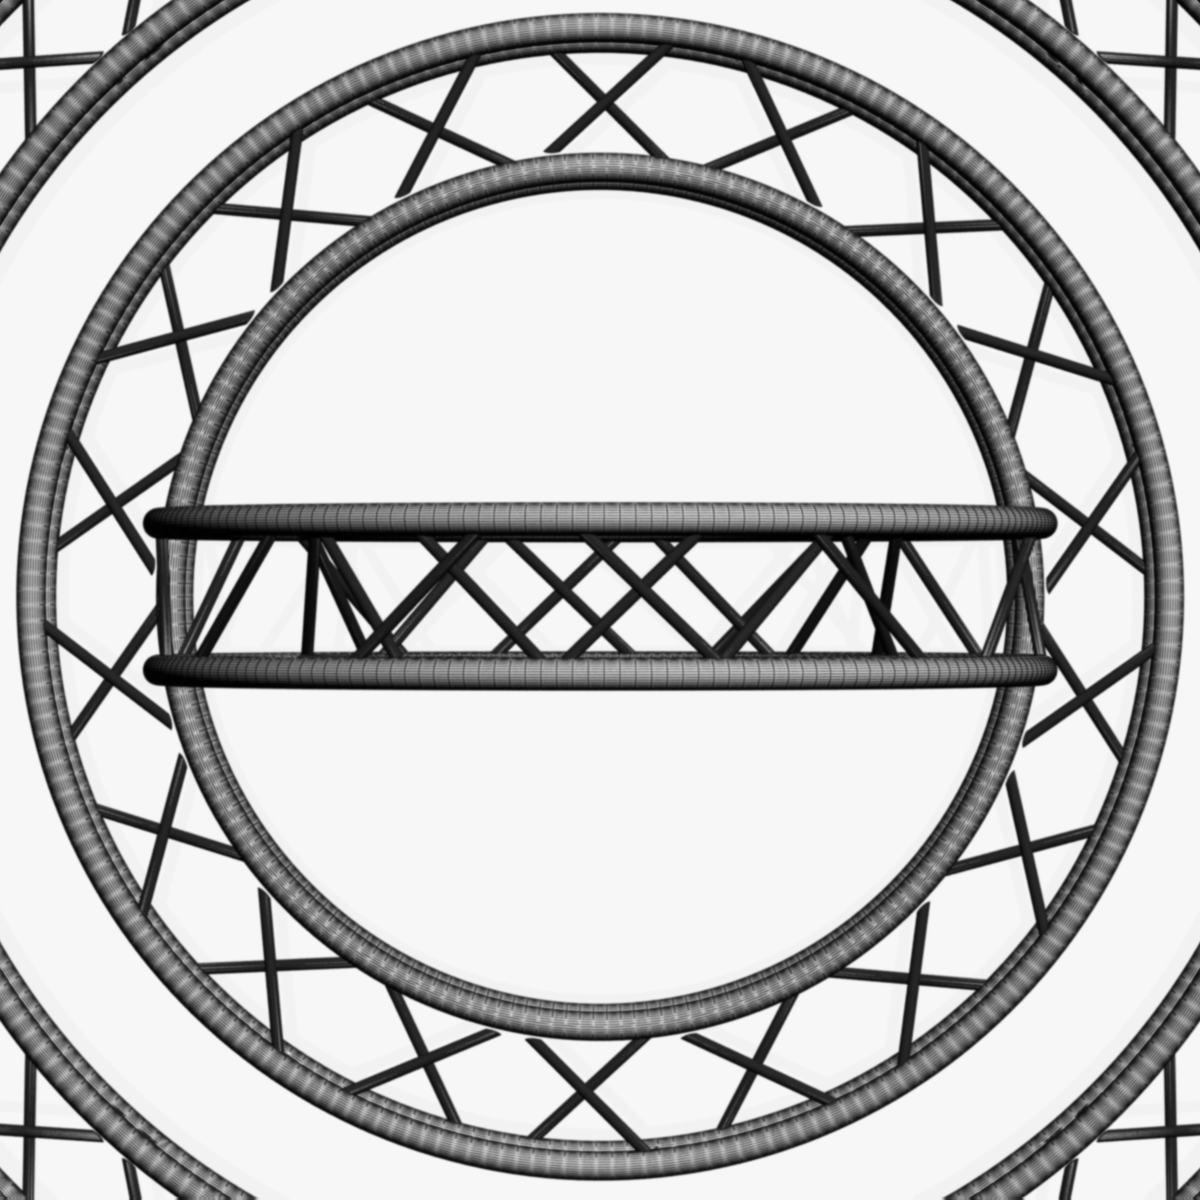 circle square truss modular collection 3d model 3ds max dxf fbx c4d dae  texture obj 252350